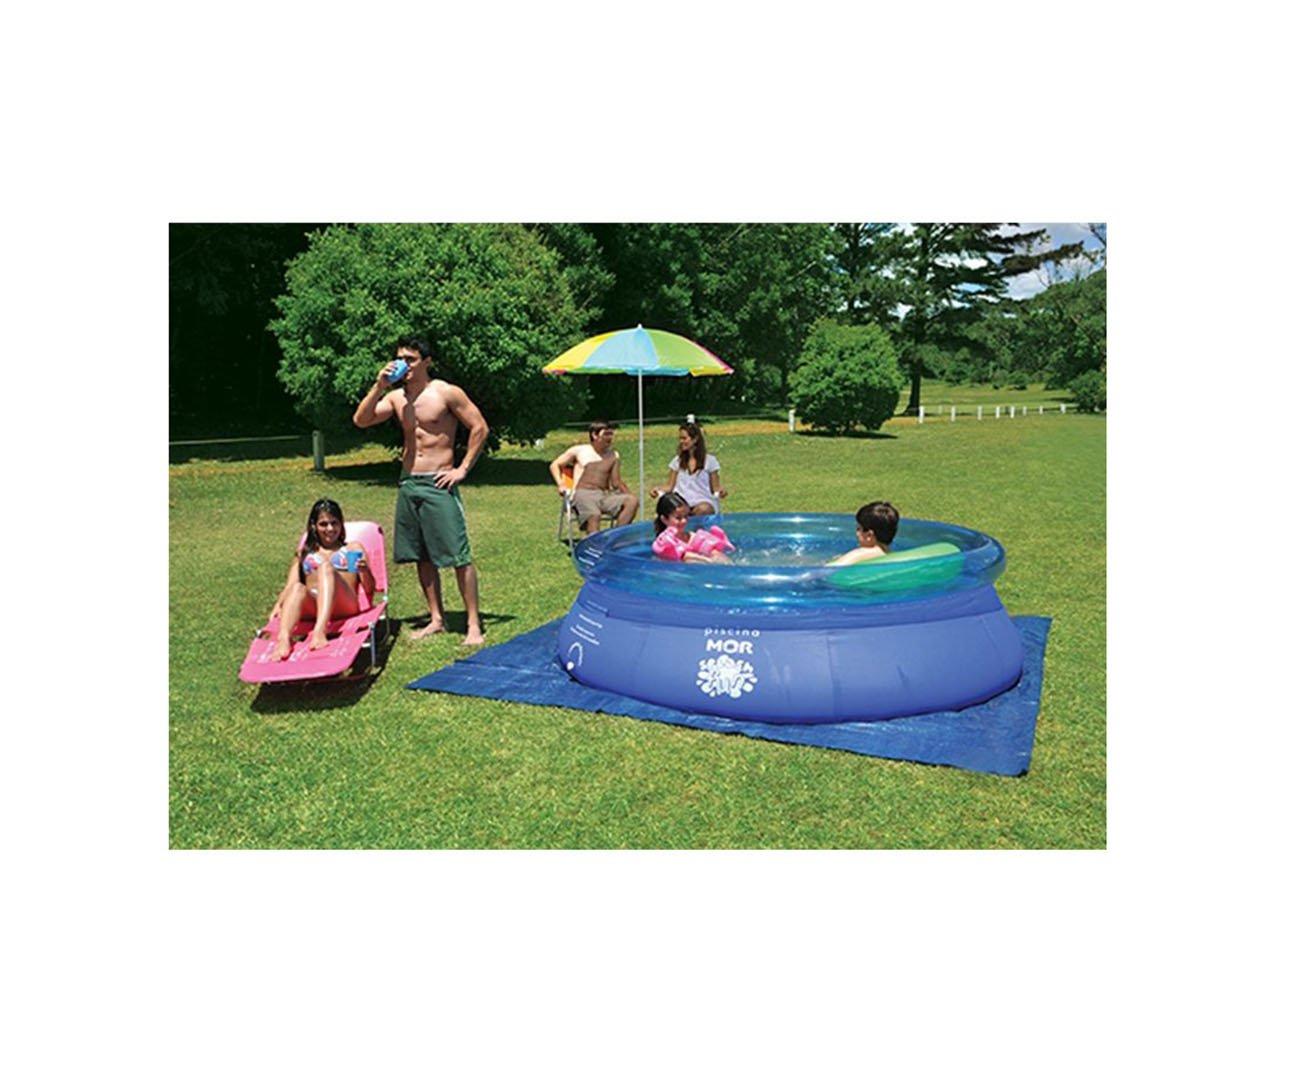 Piscina Inflável Redonda Splash Fun 2400 Litros - Mor